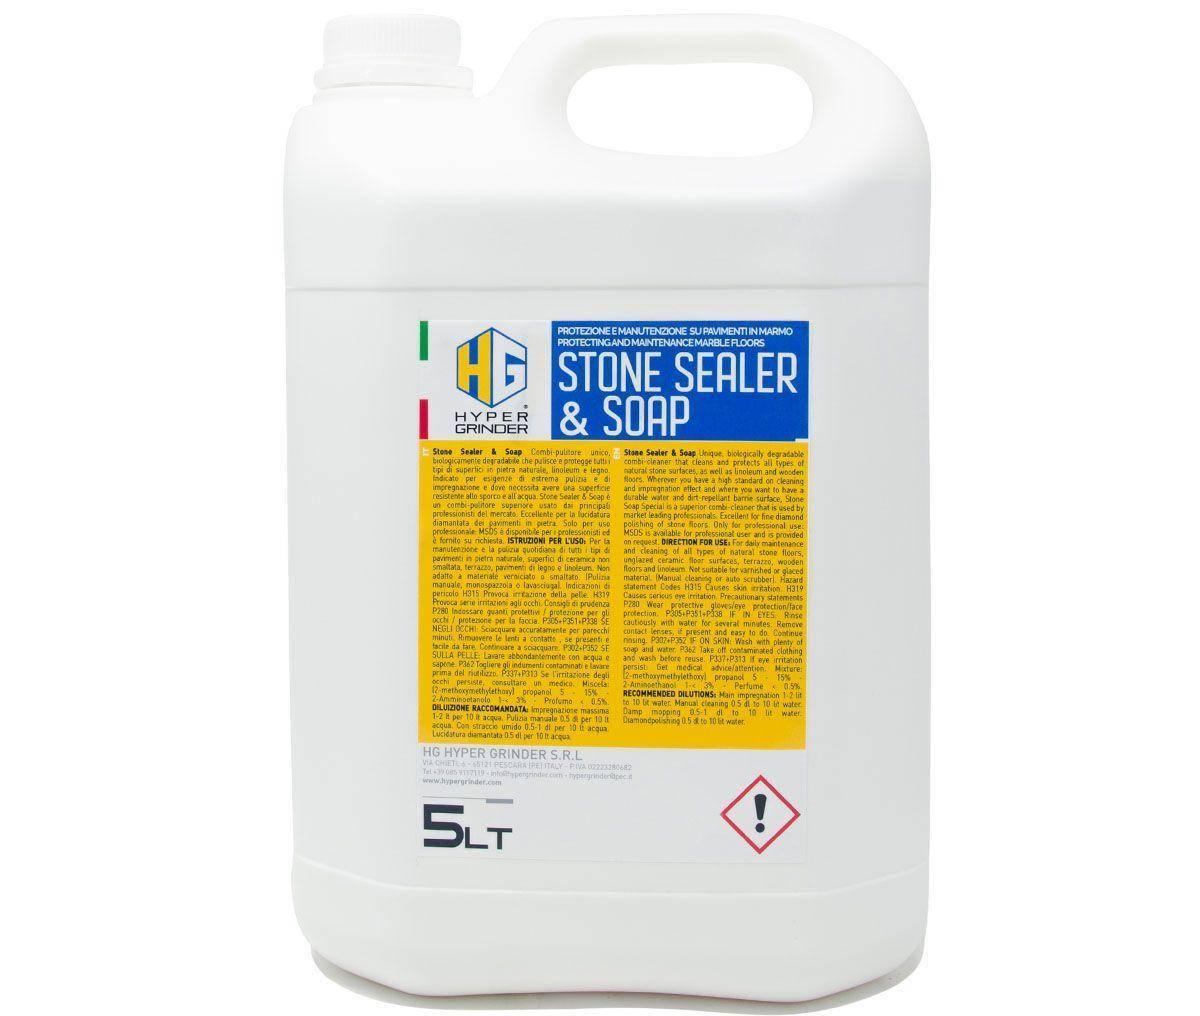 stoneSealersoap 1263